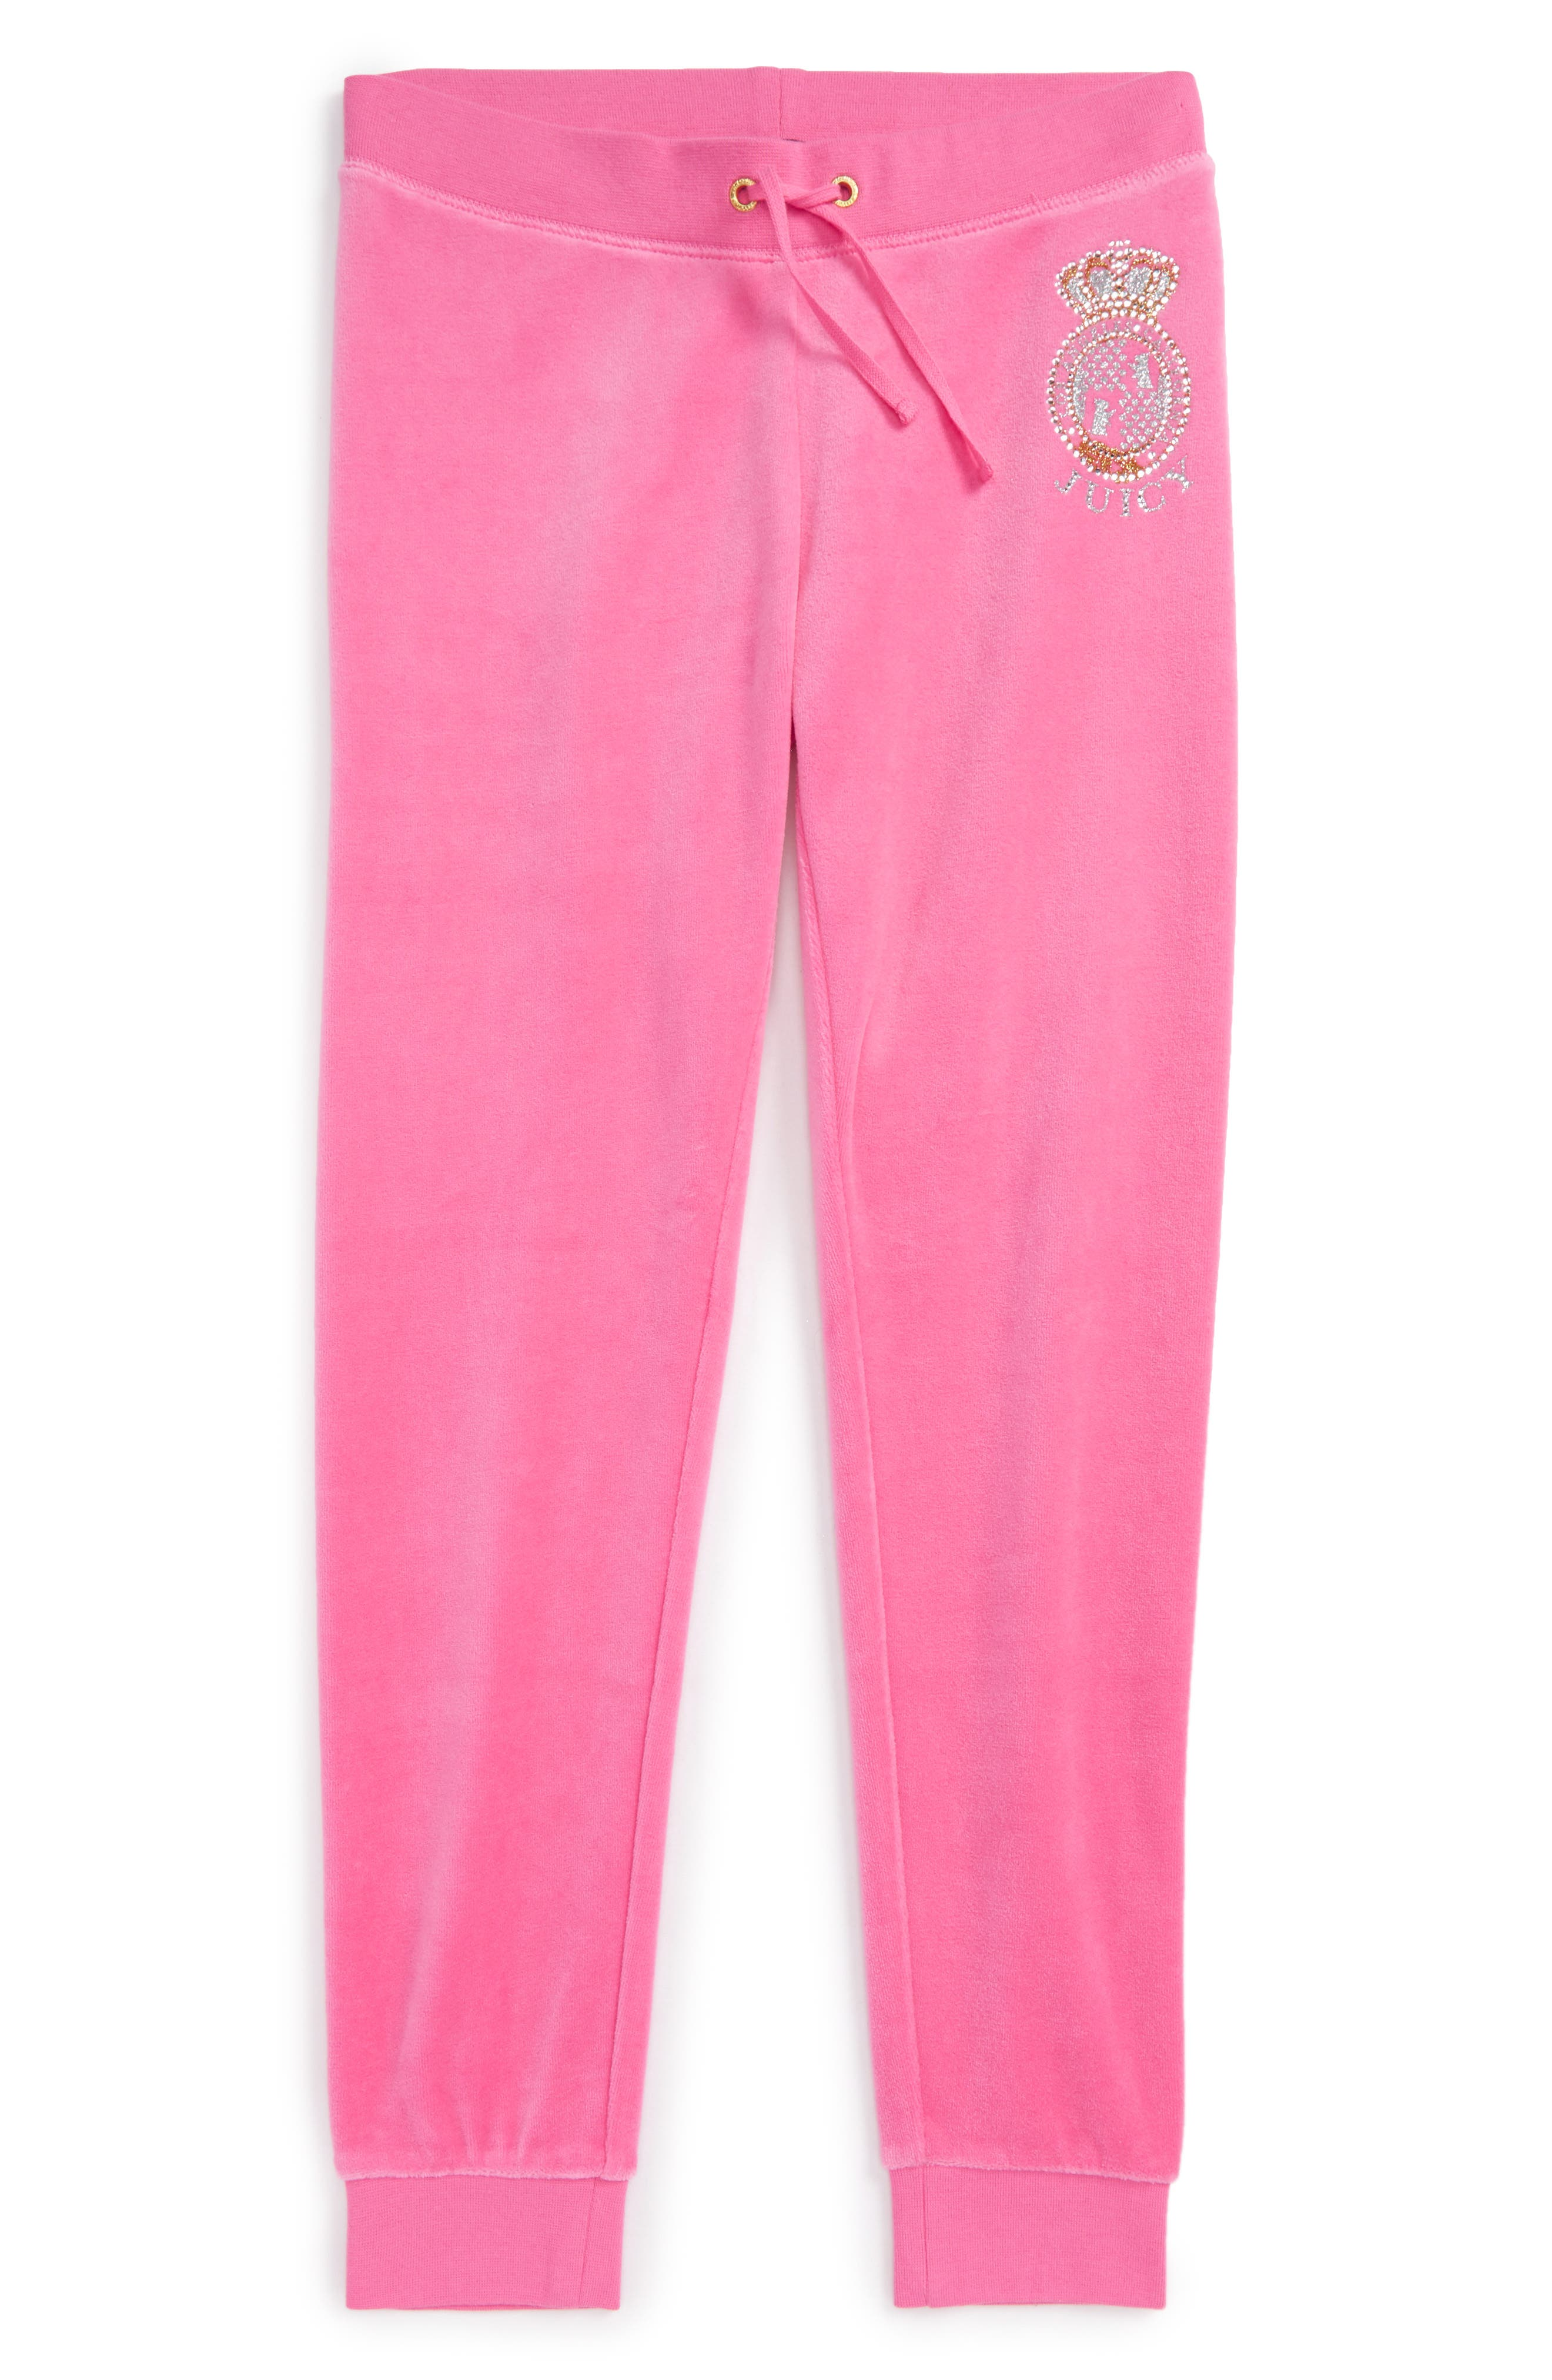 Scotty Crest Zuma Velour Pants,                         Main,                         color, Highlighter